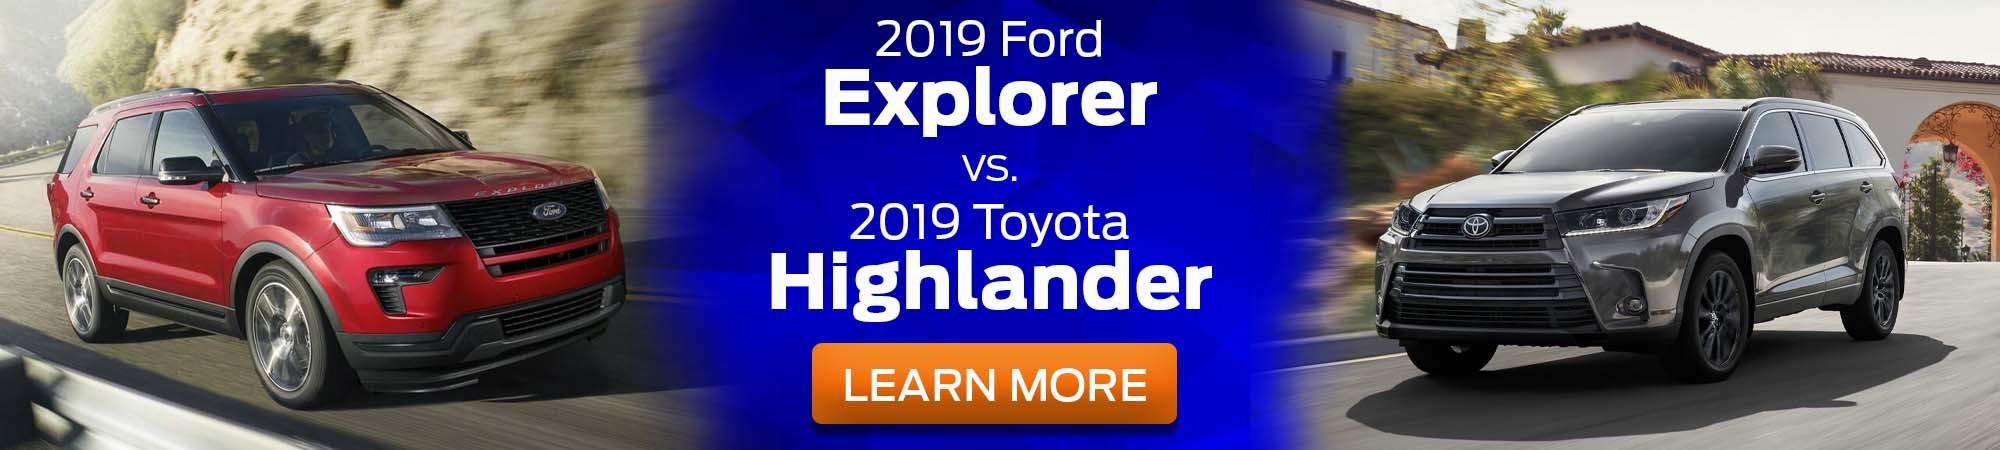 2019 Ford Explorer v 2019 Toyota Highlander